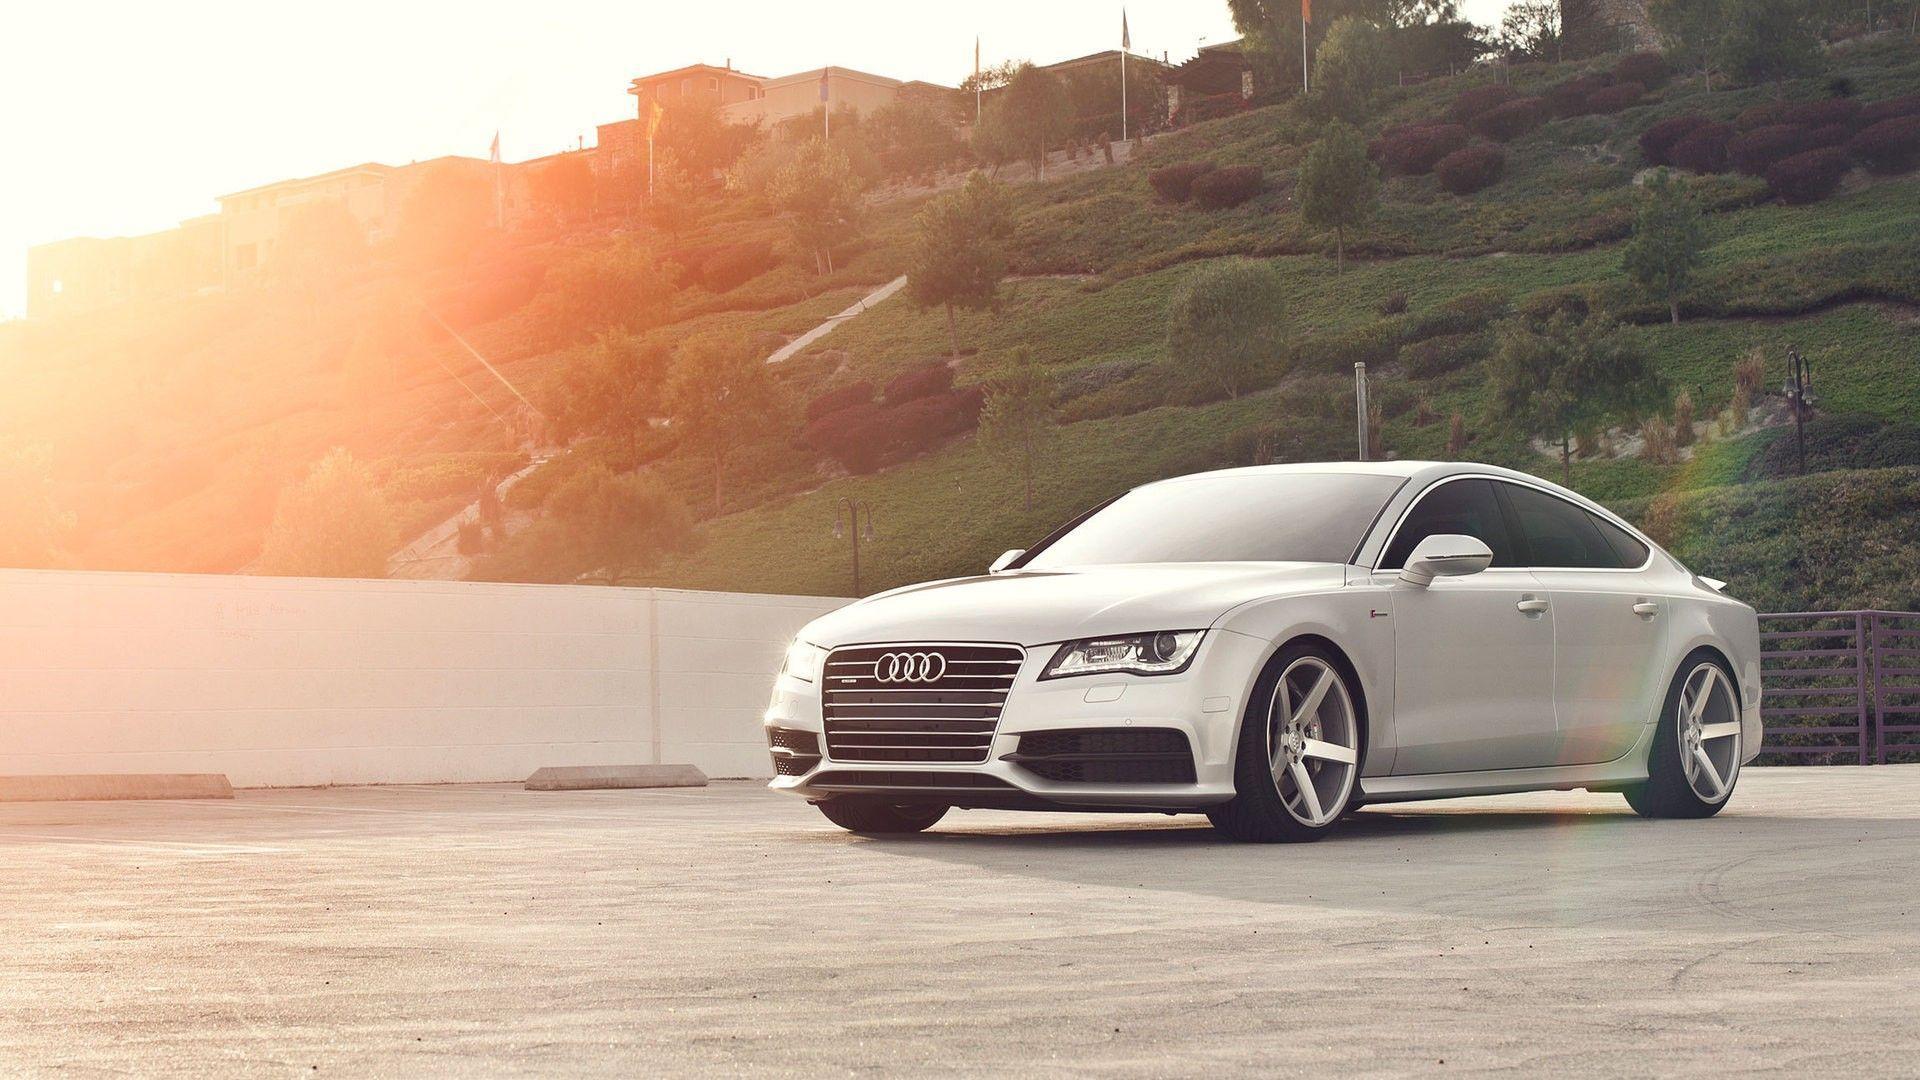 8k Ultra Hd Audi Wallpapers Top Free 8k Ultra Hd Audi Backgrounds Wallpaperaccess